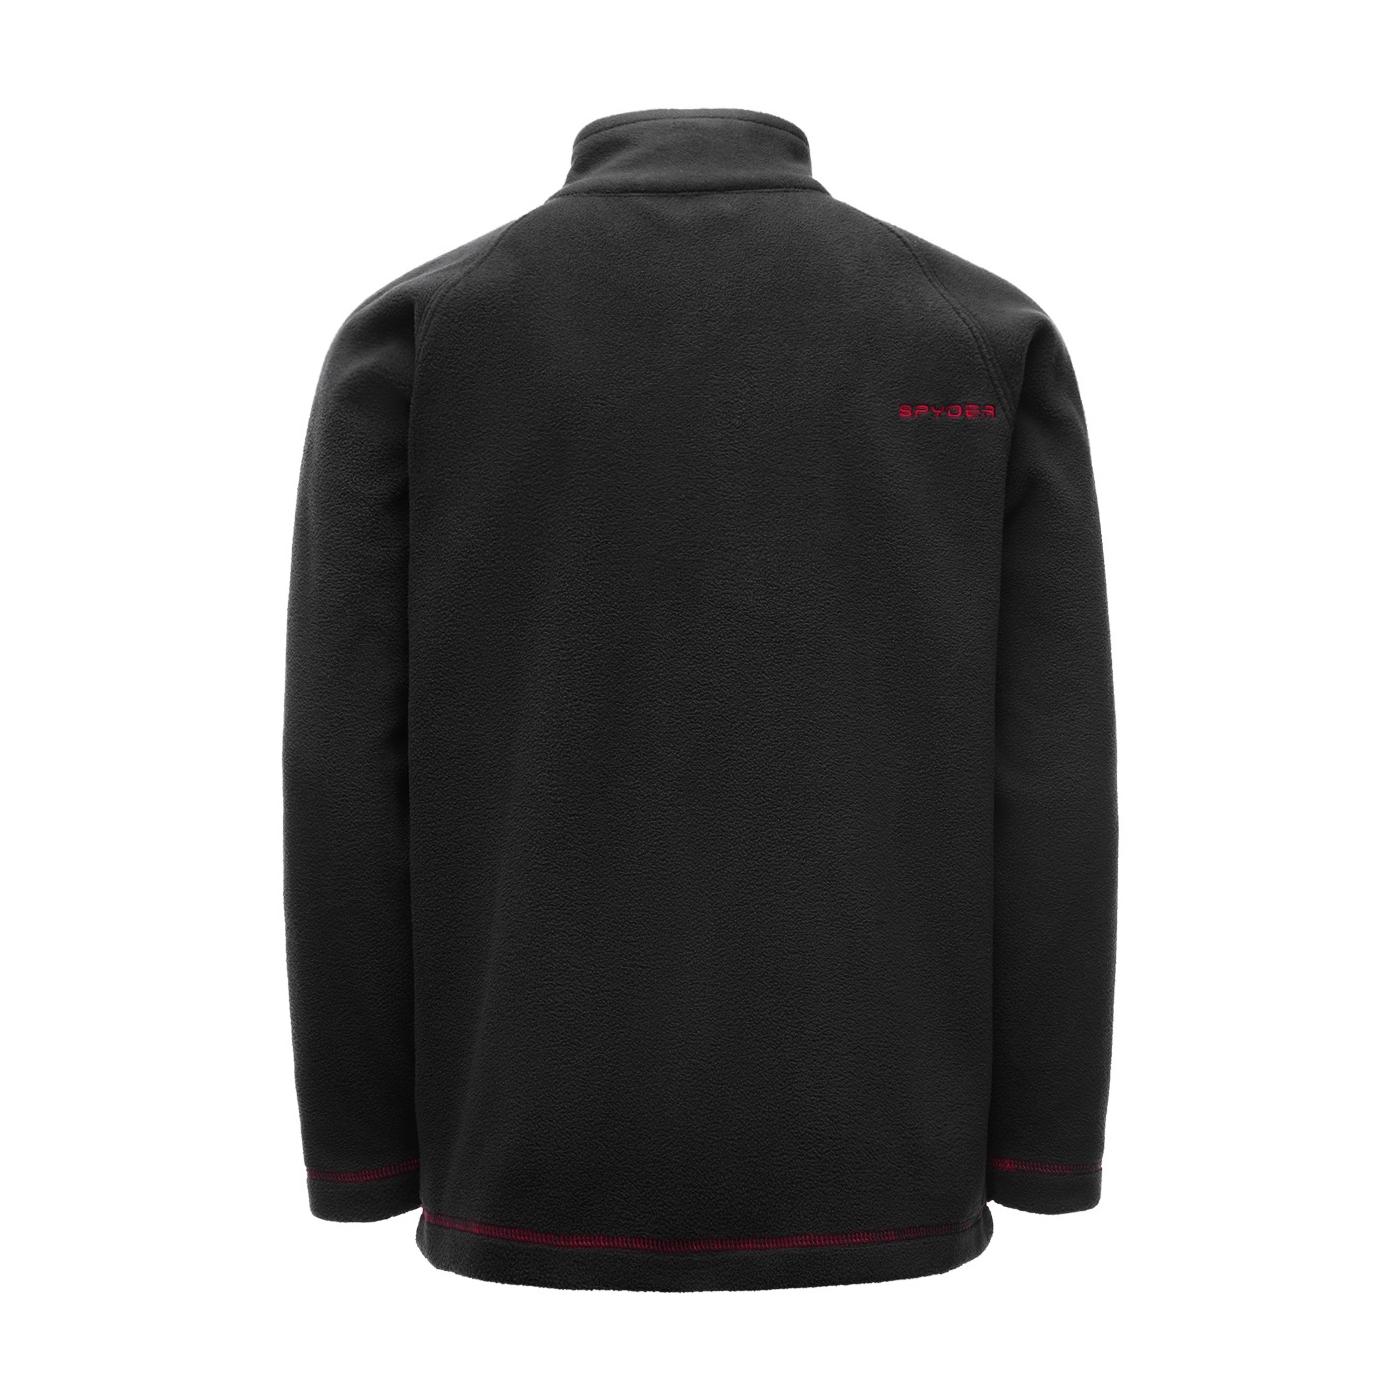 Spyder Polaire Boys Speed Fleece Top Black Red